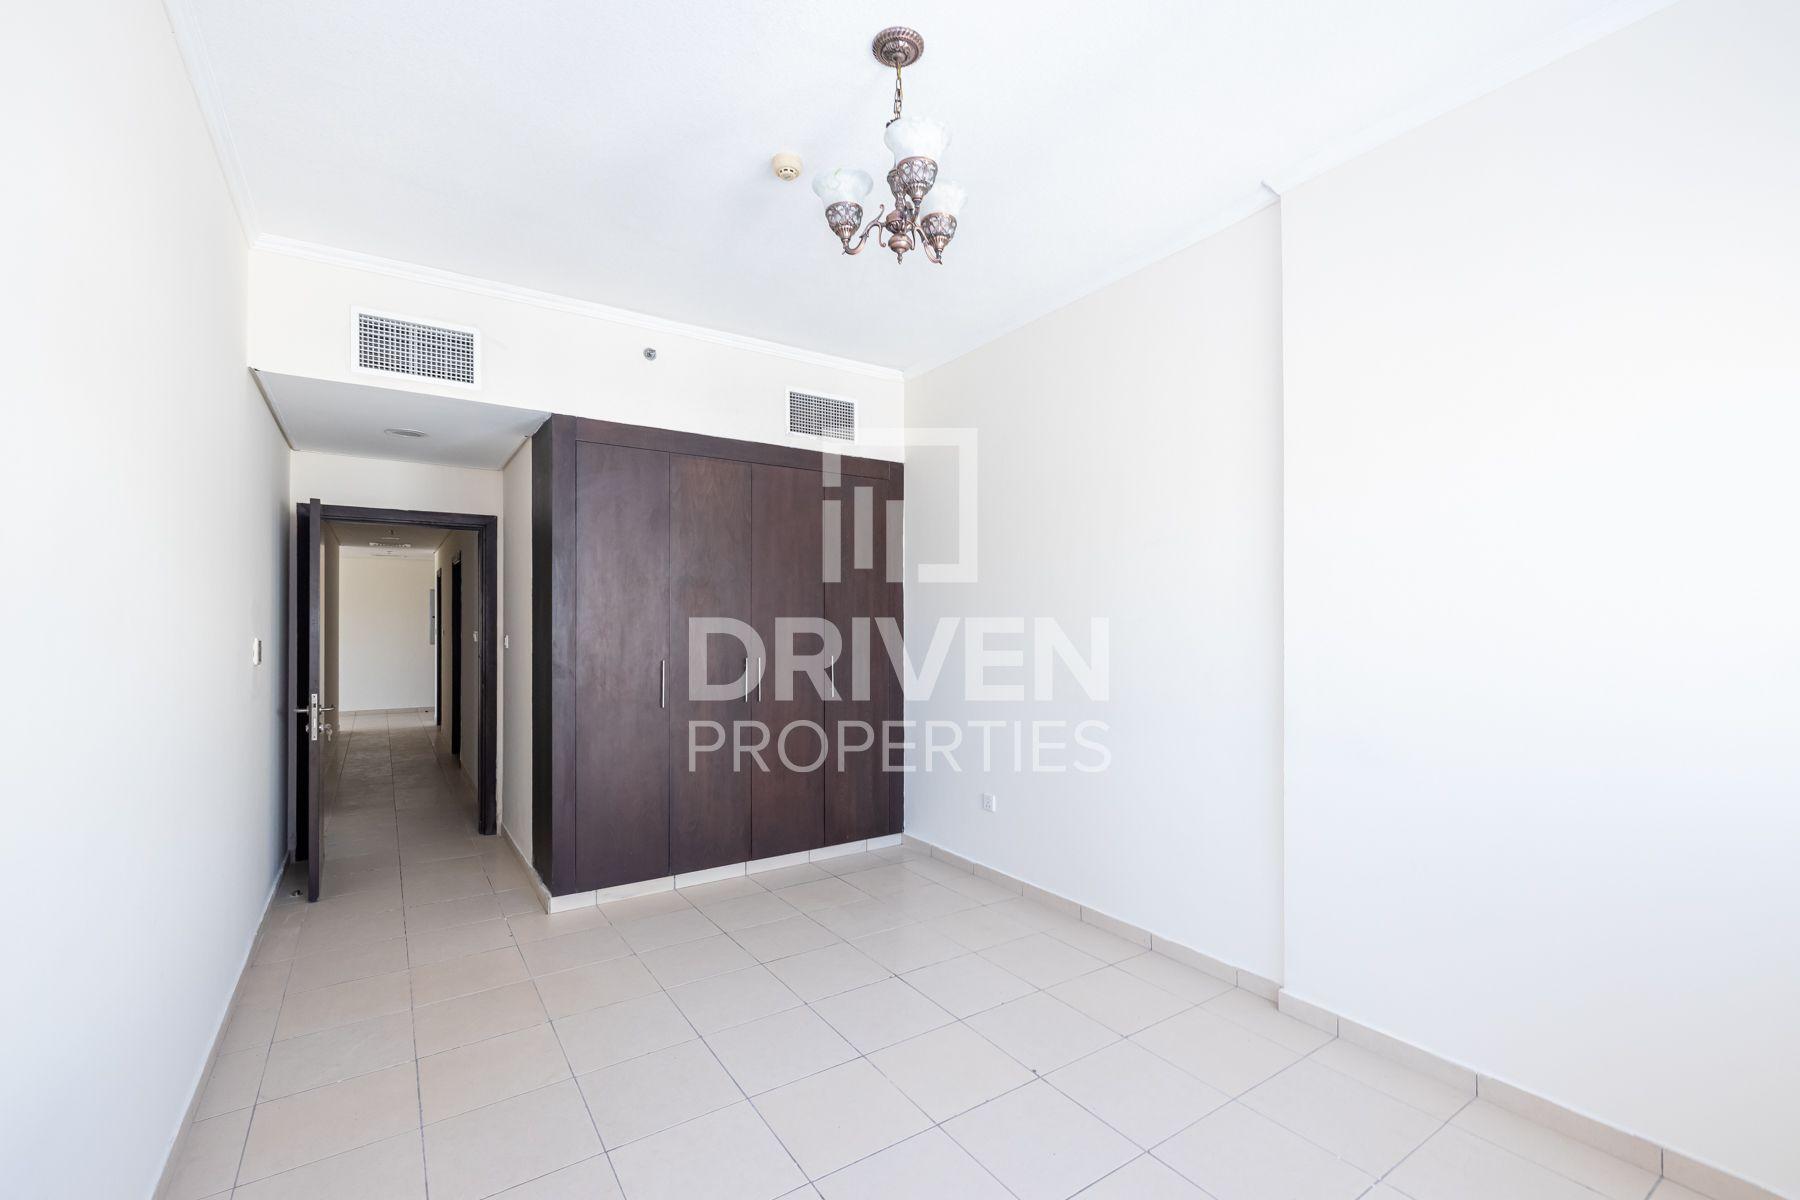 Apartment for Rent in Mazaya 29 - Dubai Land